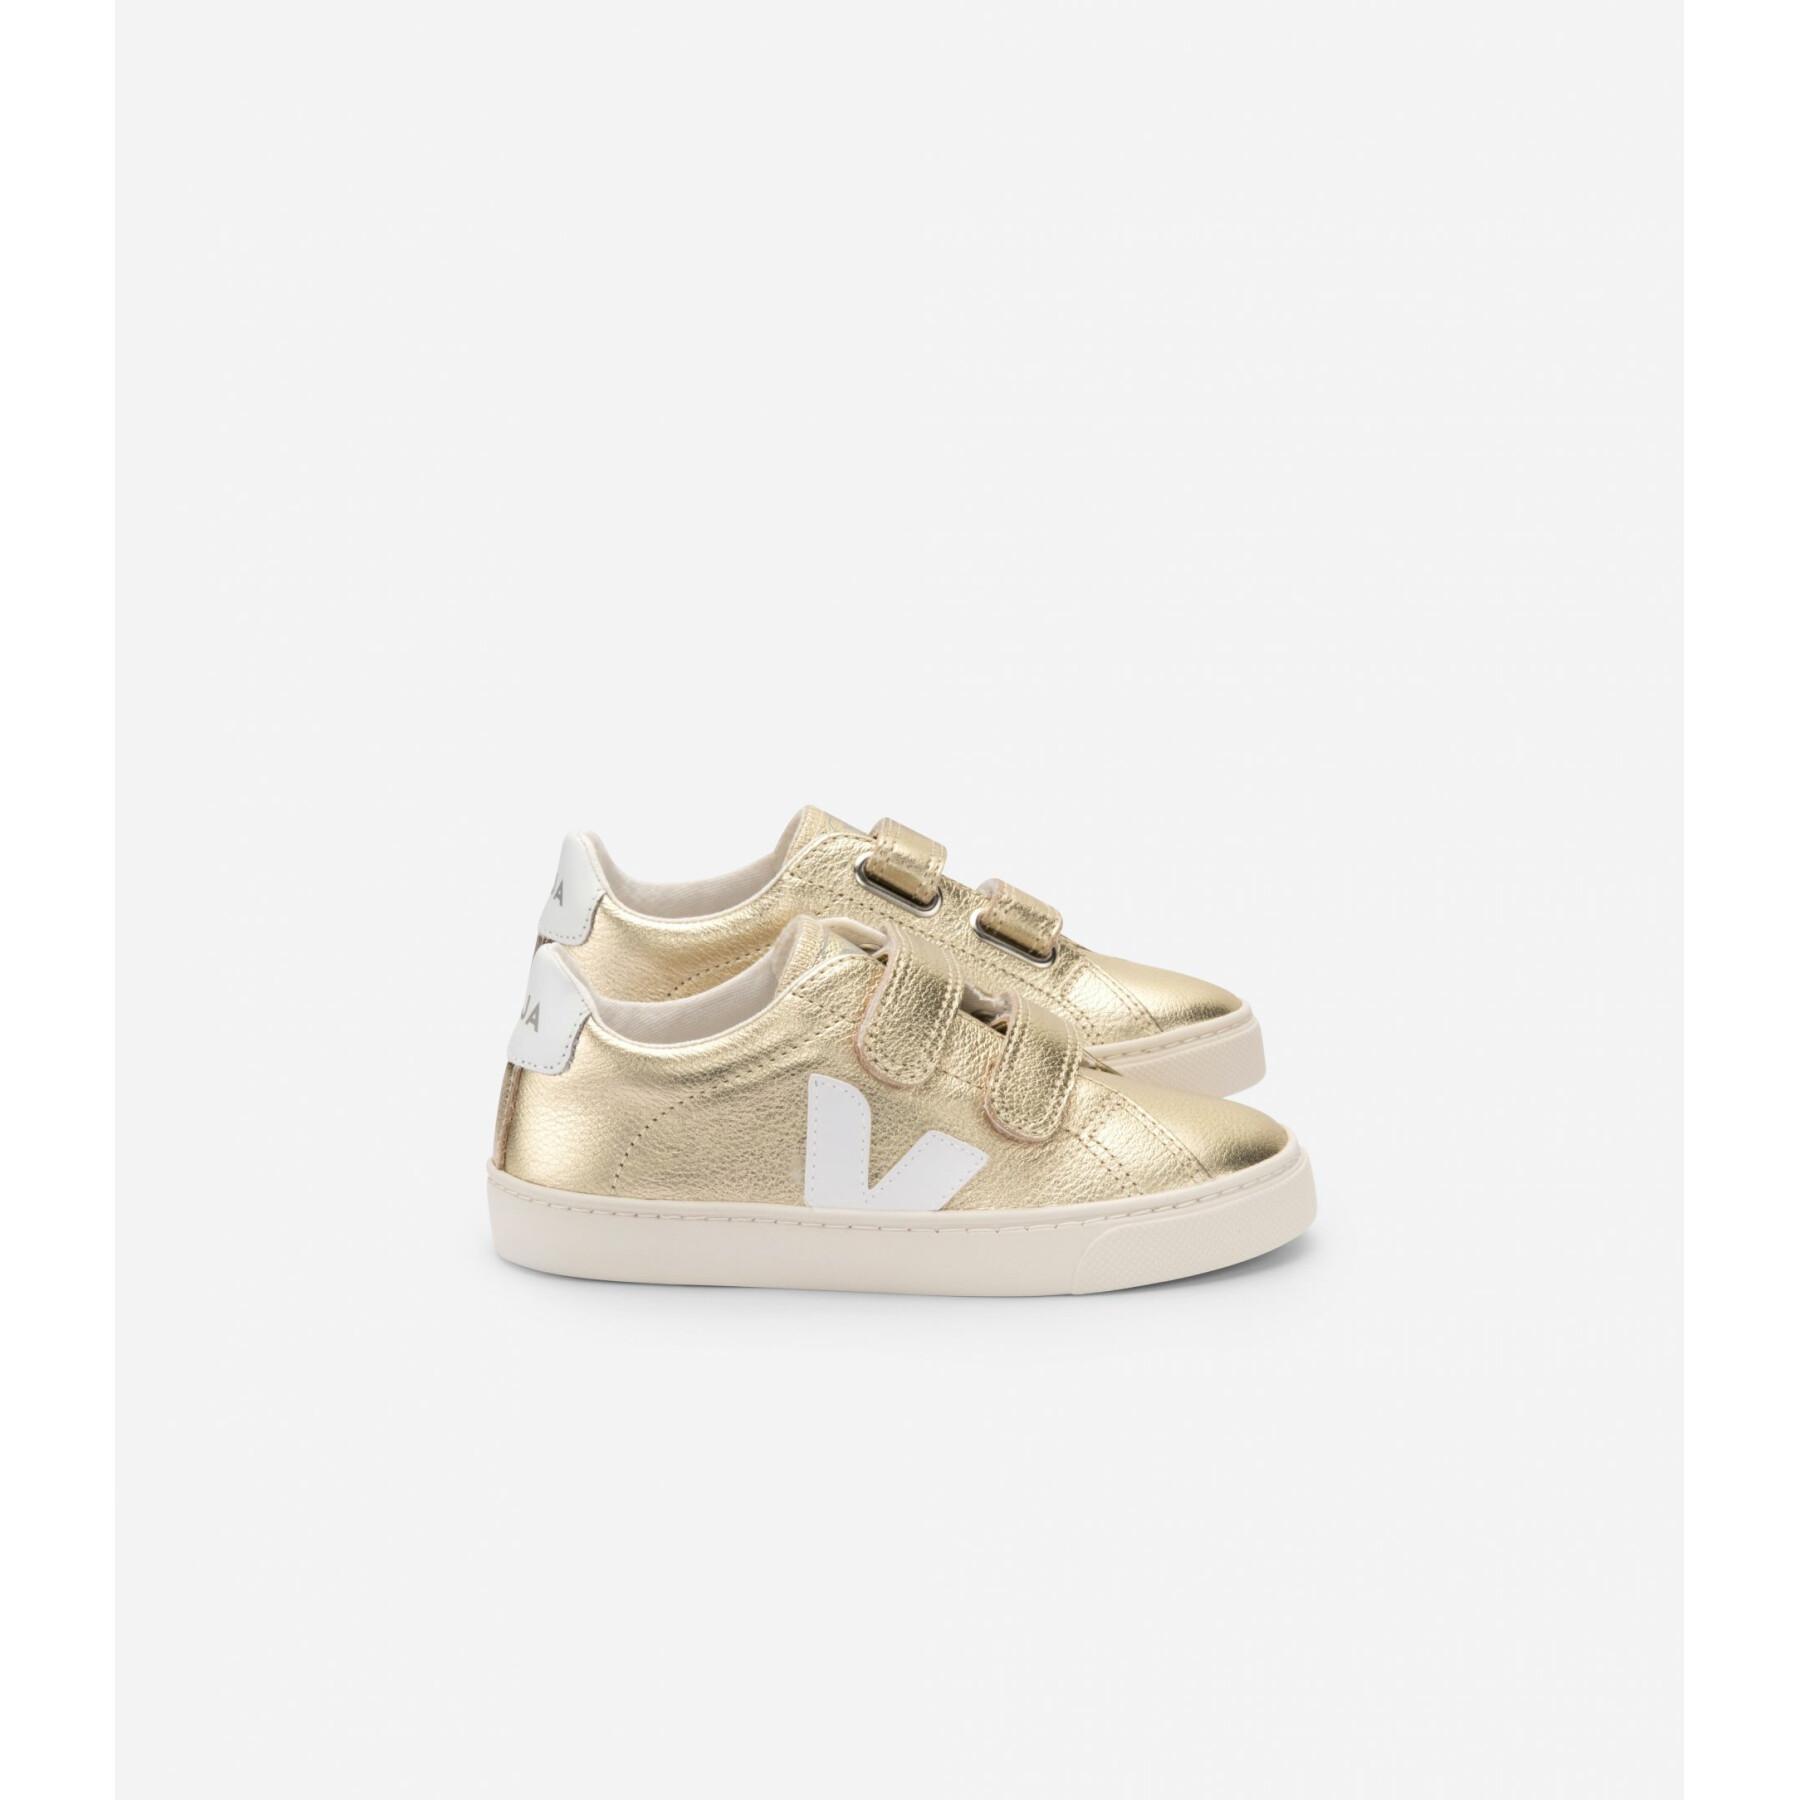 Zapatos para niños Veja Esplar Leather Gold